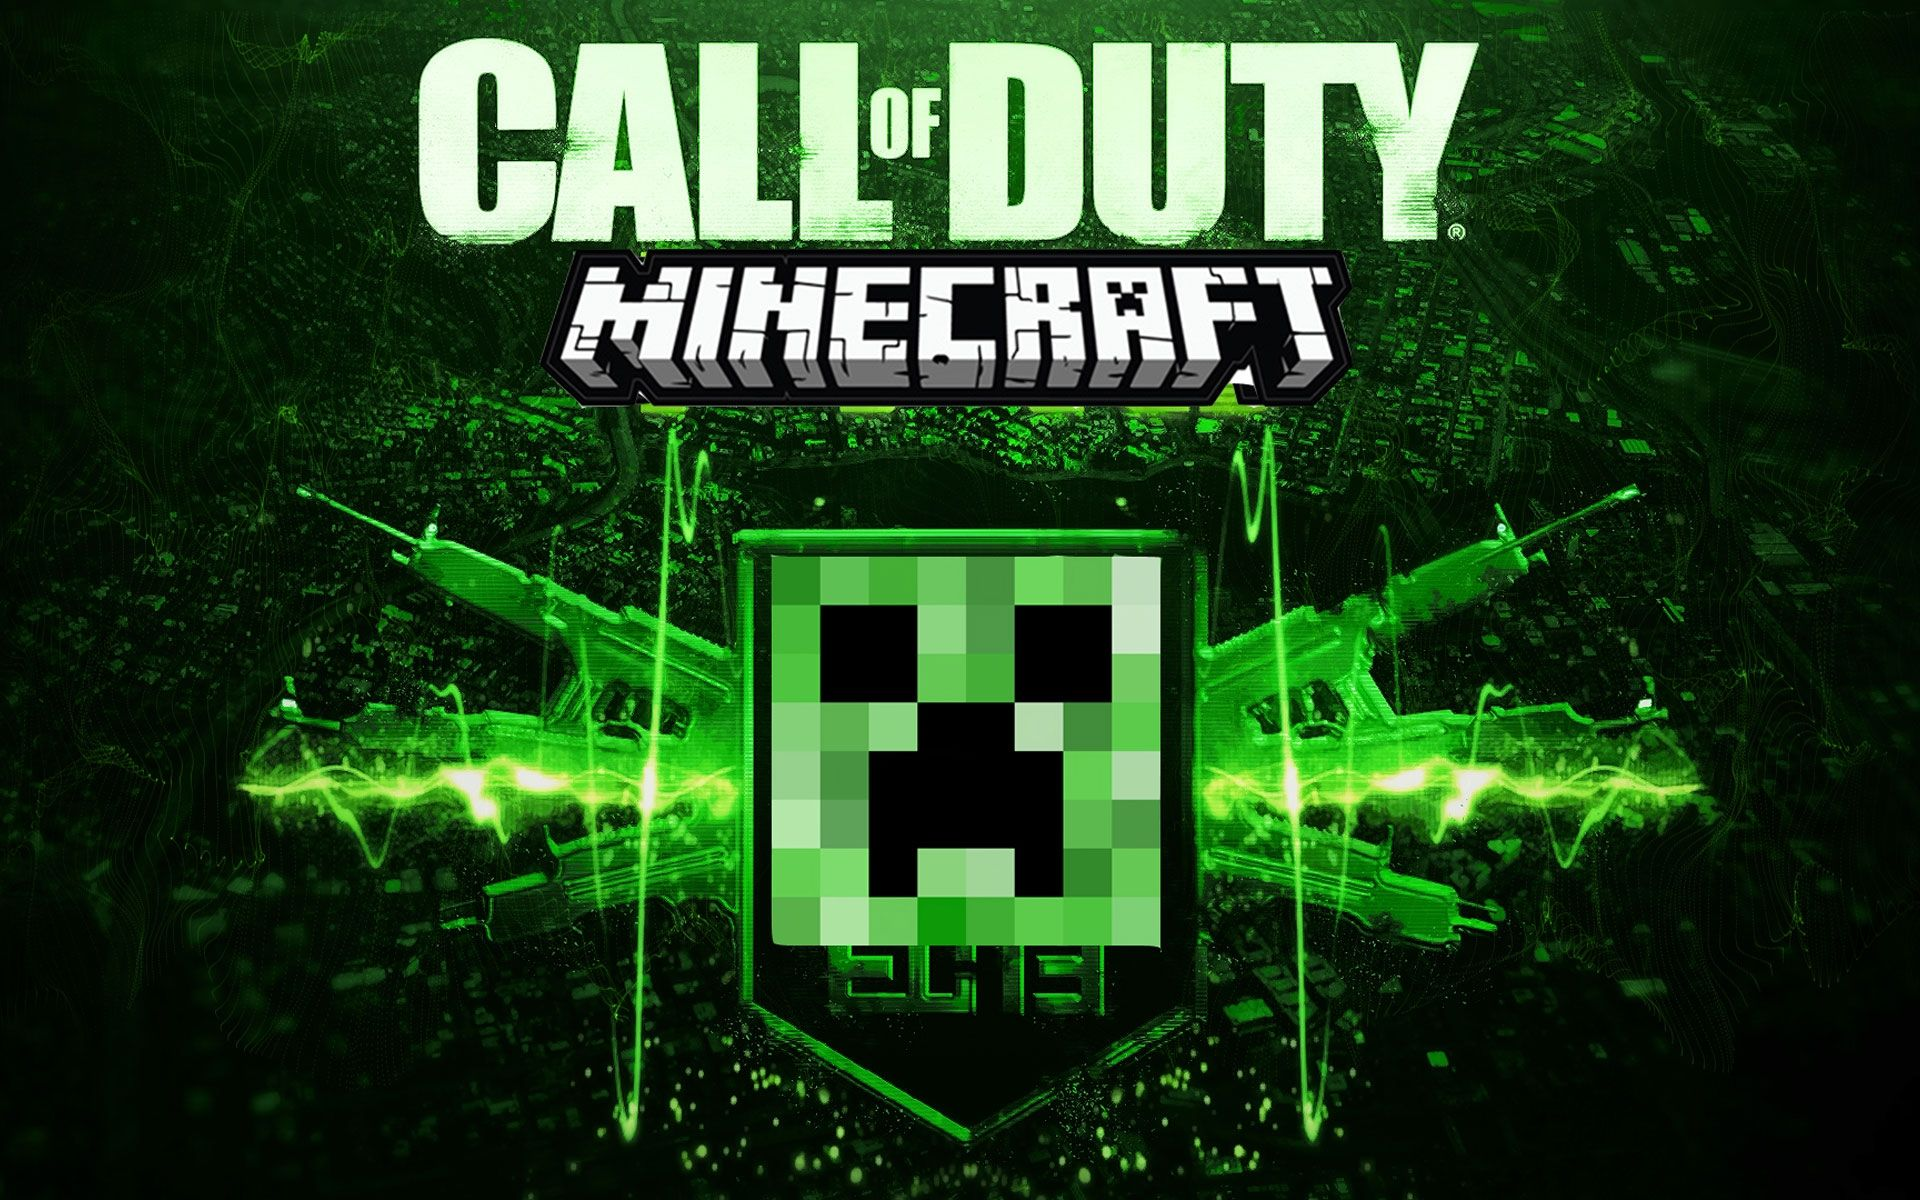 Good Wallpaper Minecraft Poster - 1270265845c57a25573c5558c91a838b  Gallery_949164.jpg